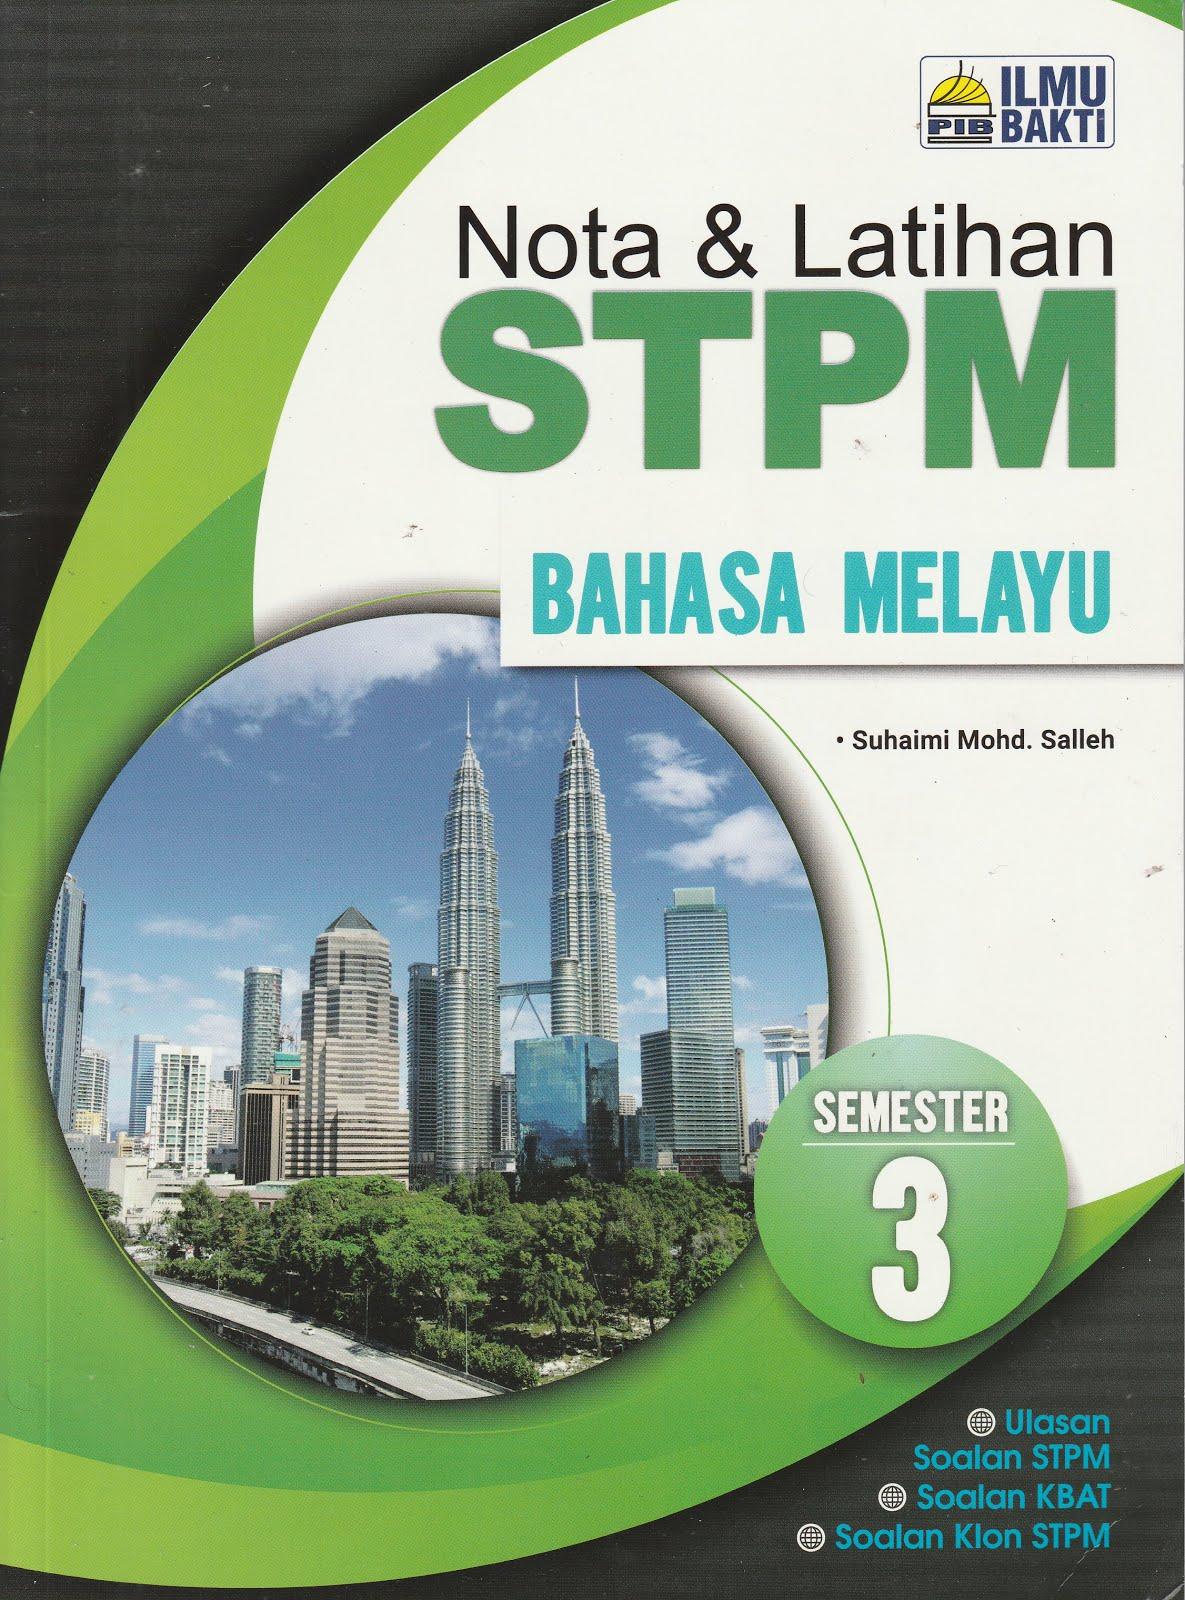 NOTA & LATIHAN STPM SEMESTER 3